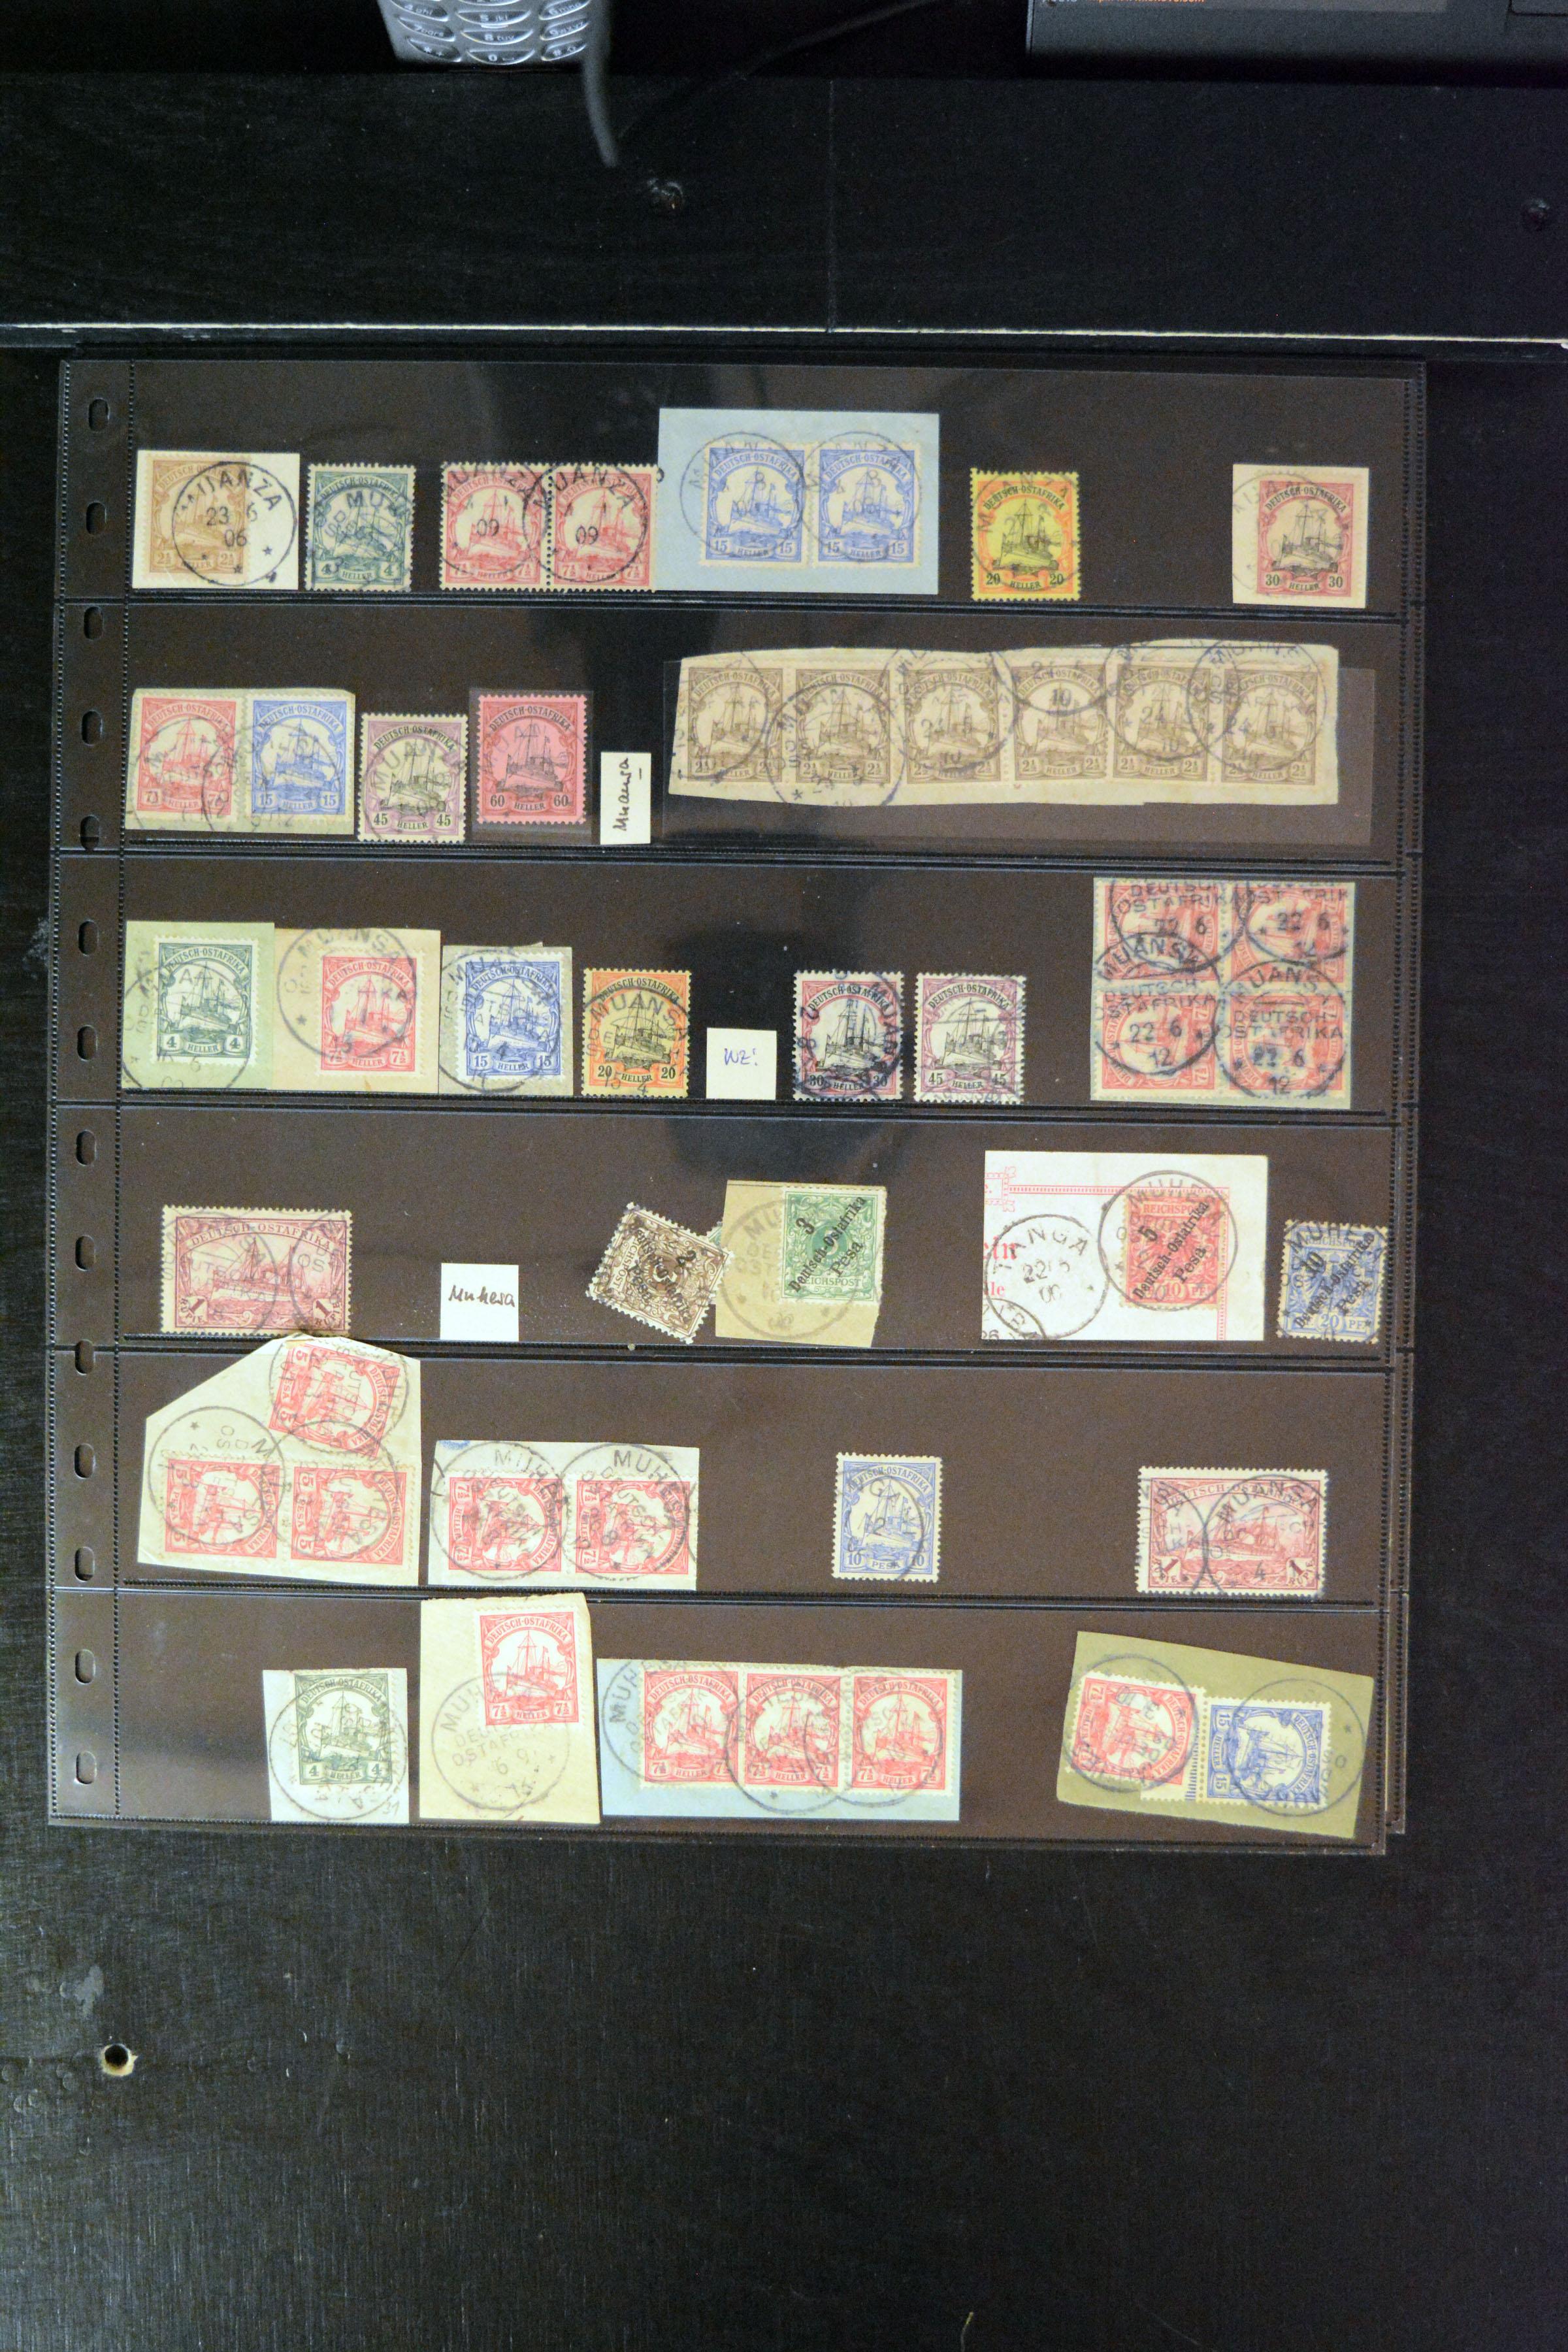 Lot 4880 - german colonies and offices abroad german east africa -  Heinrich Koehler Auktionen 373rd Heinrich Köhler auction - Day 3